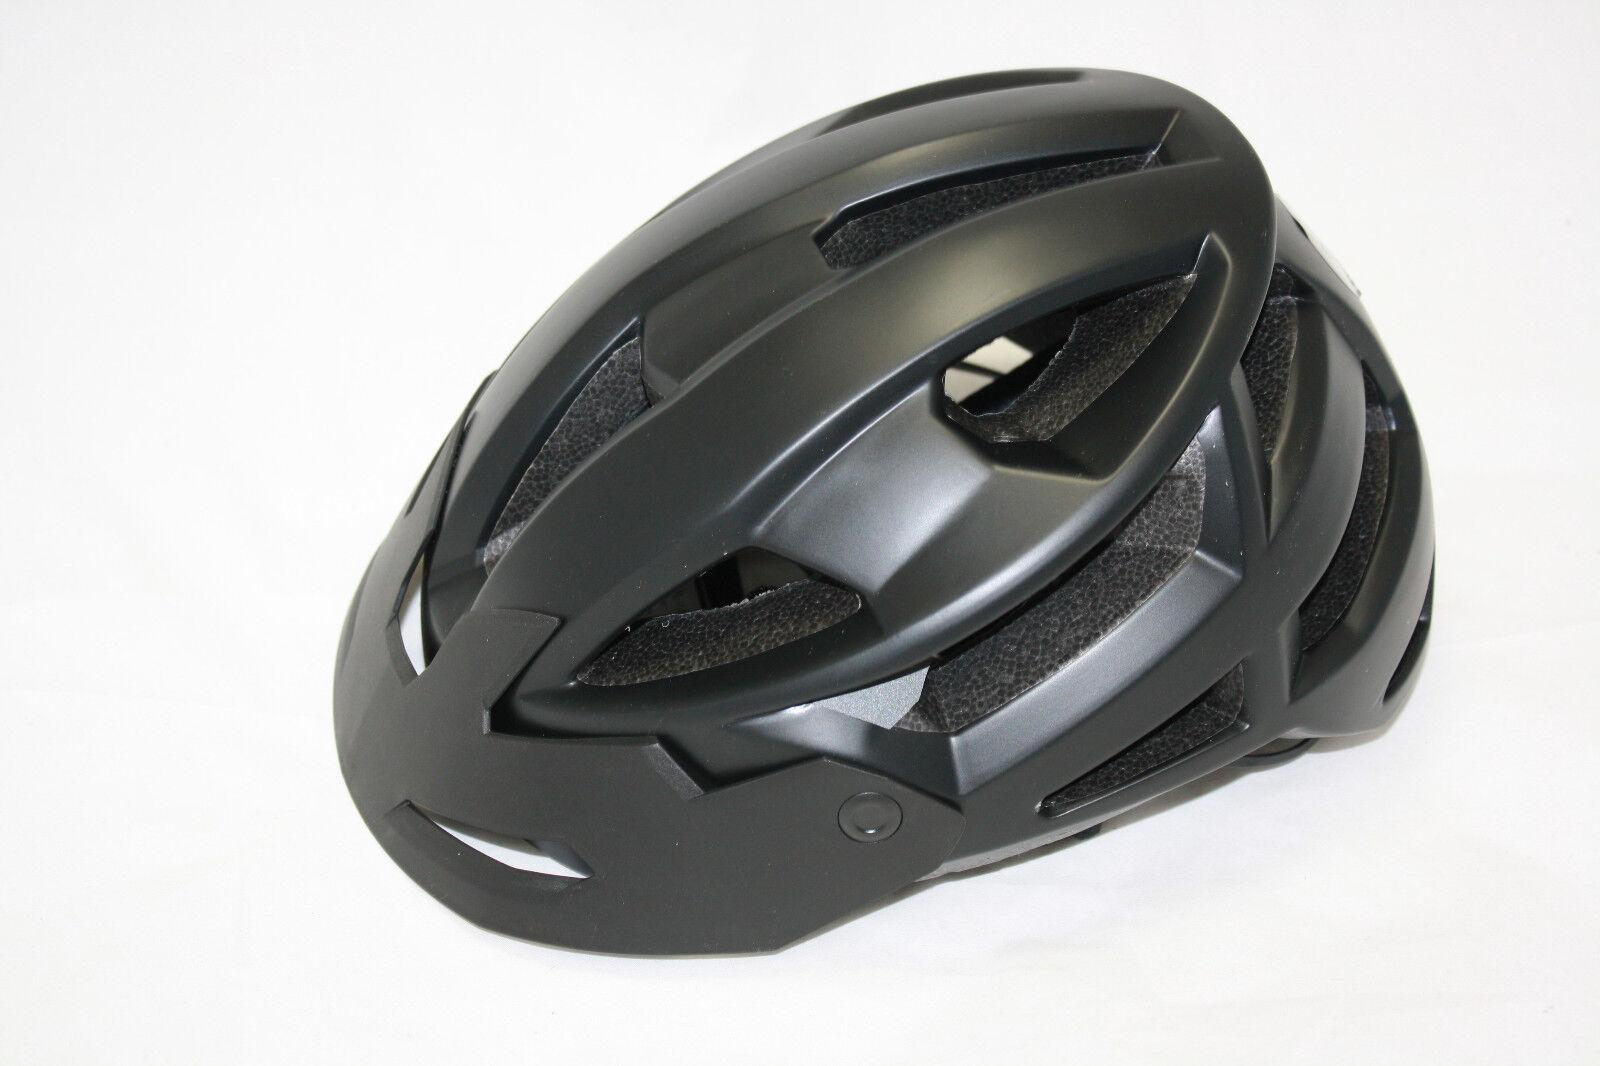 Bern casco  fl-1xc inmold MTB casco bici casco  s  52-55,5cm, maletero negro  tienda